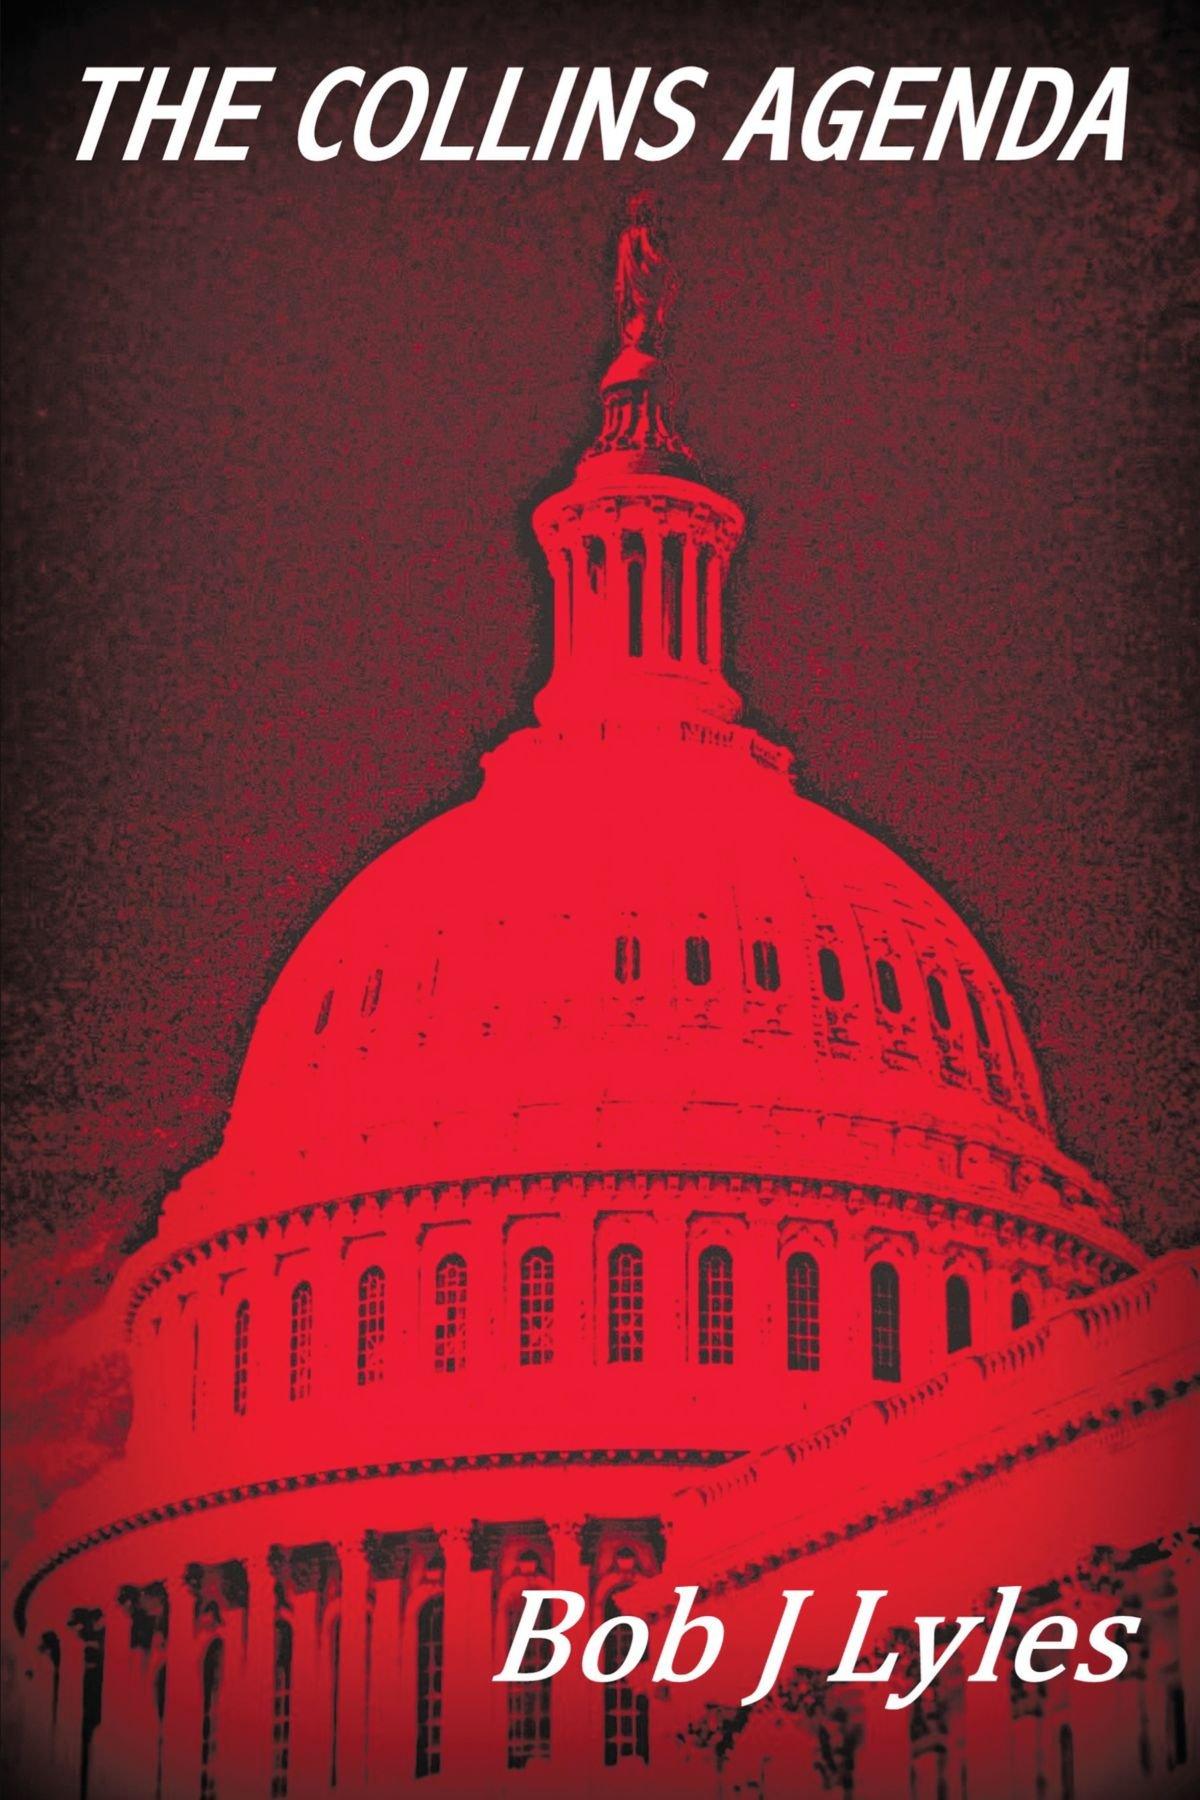 Amazon.com: The Collins Agenda (9781434368447): Bob J Lyles ...